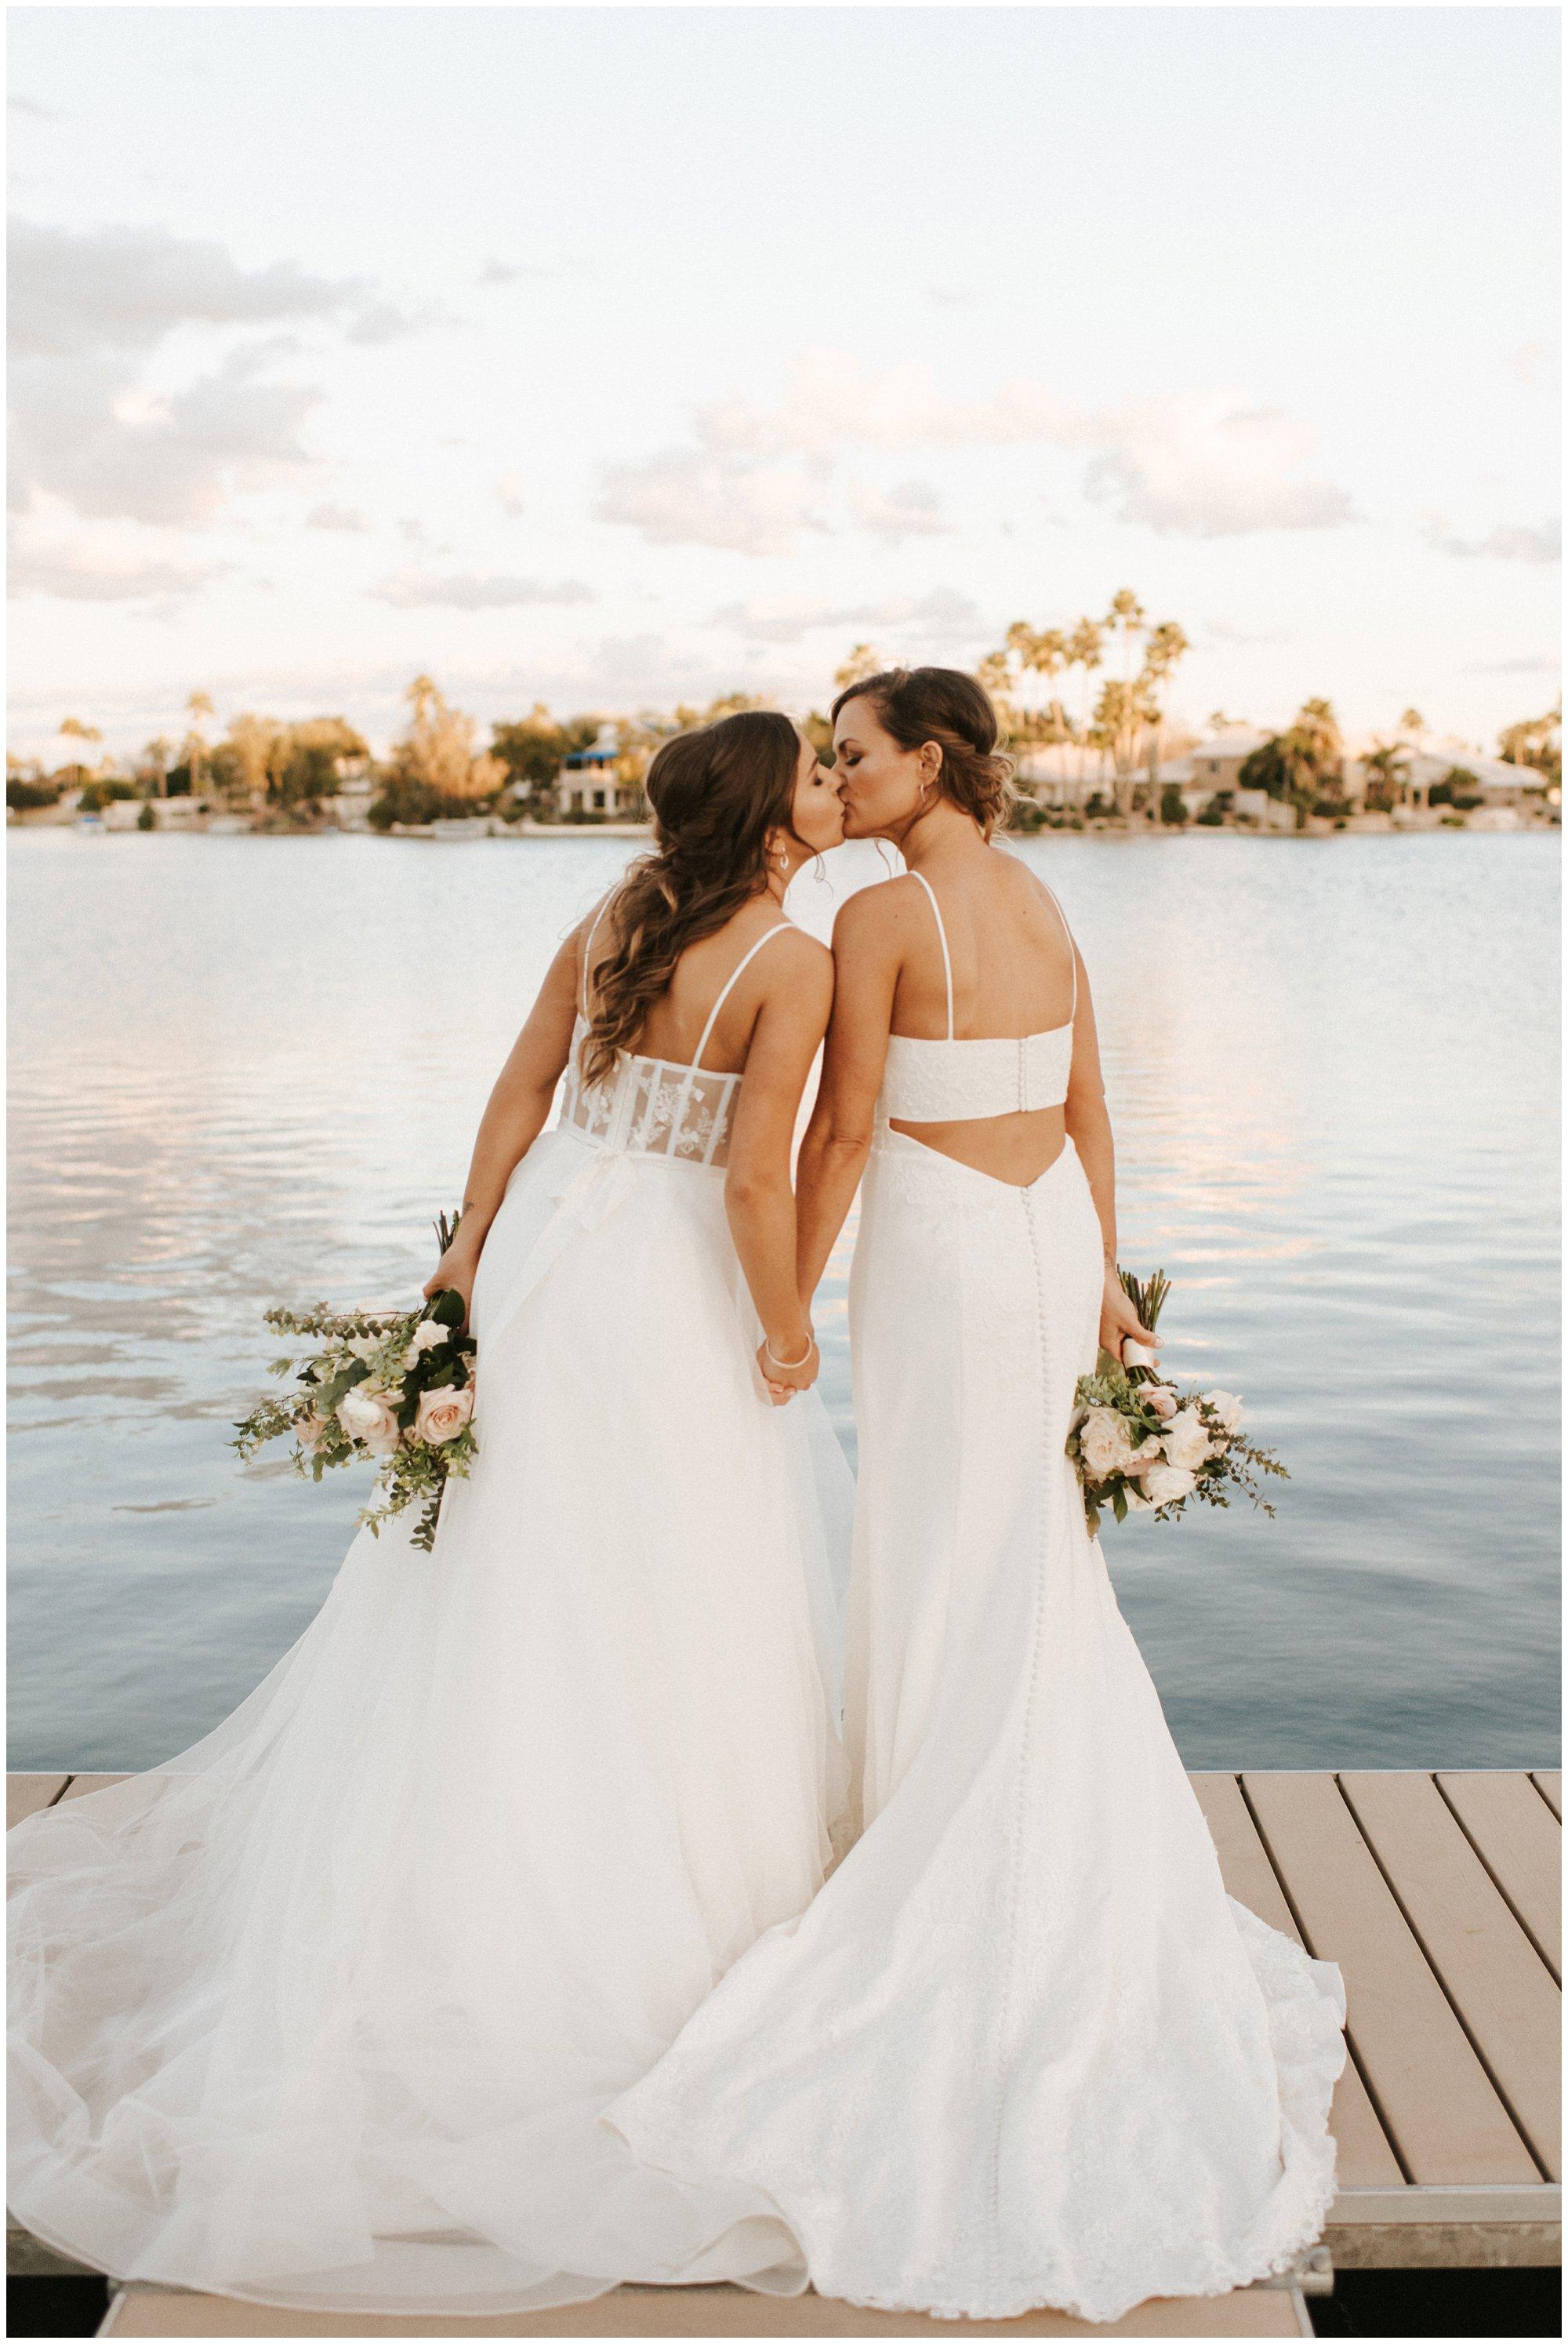 arizona same sex wedding photographer - jenni and lauren wedding the islands clubhouse_0090.jpg